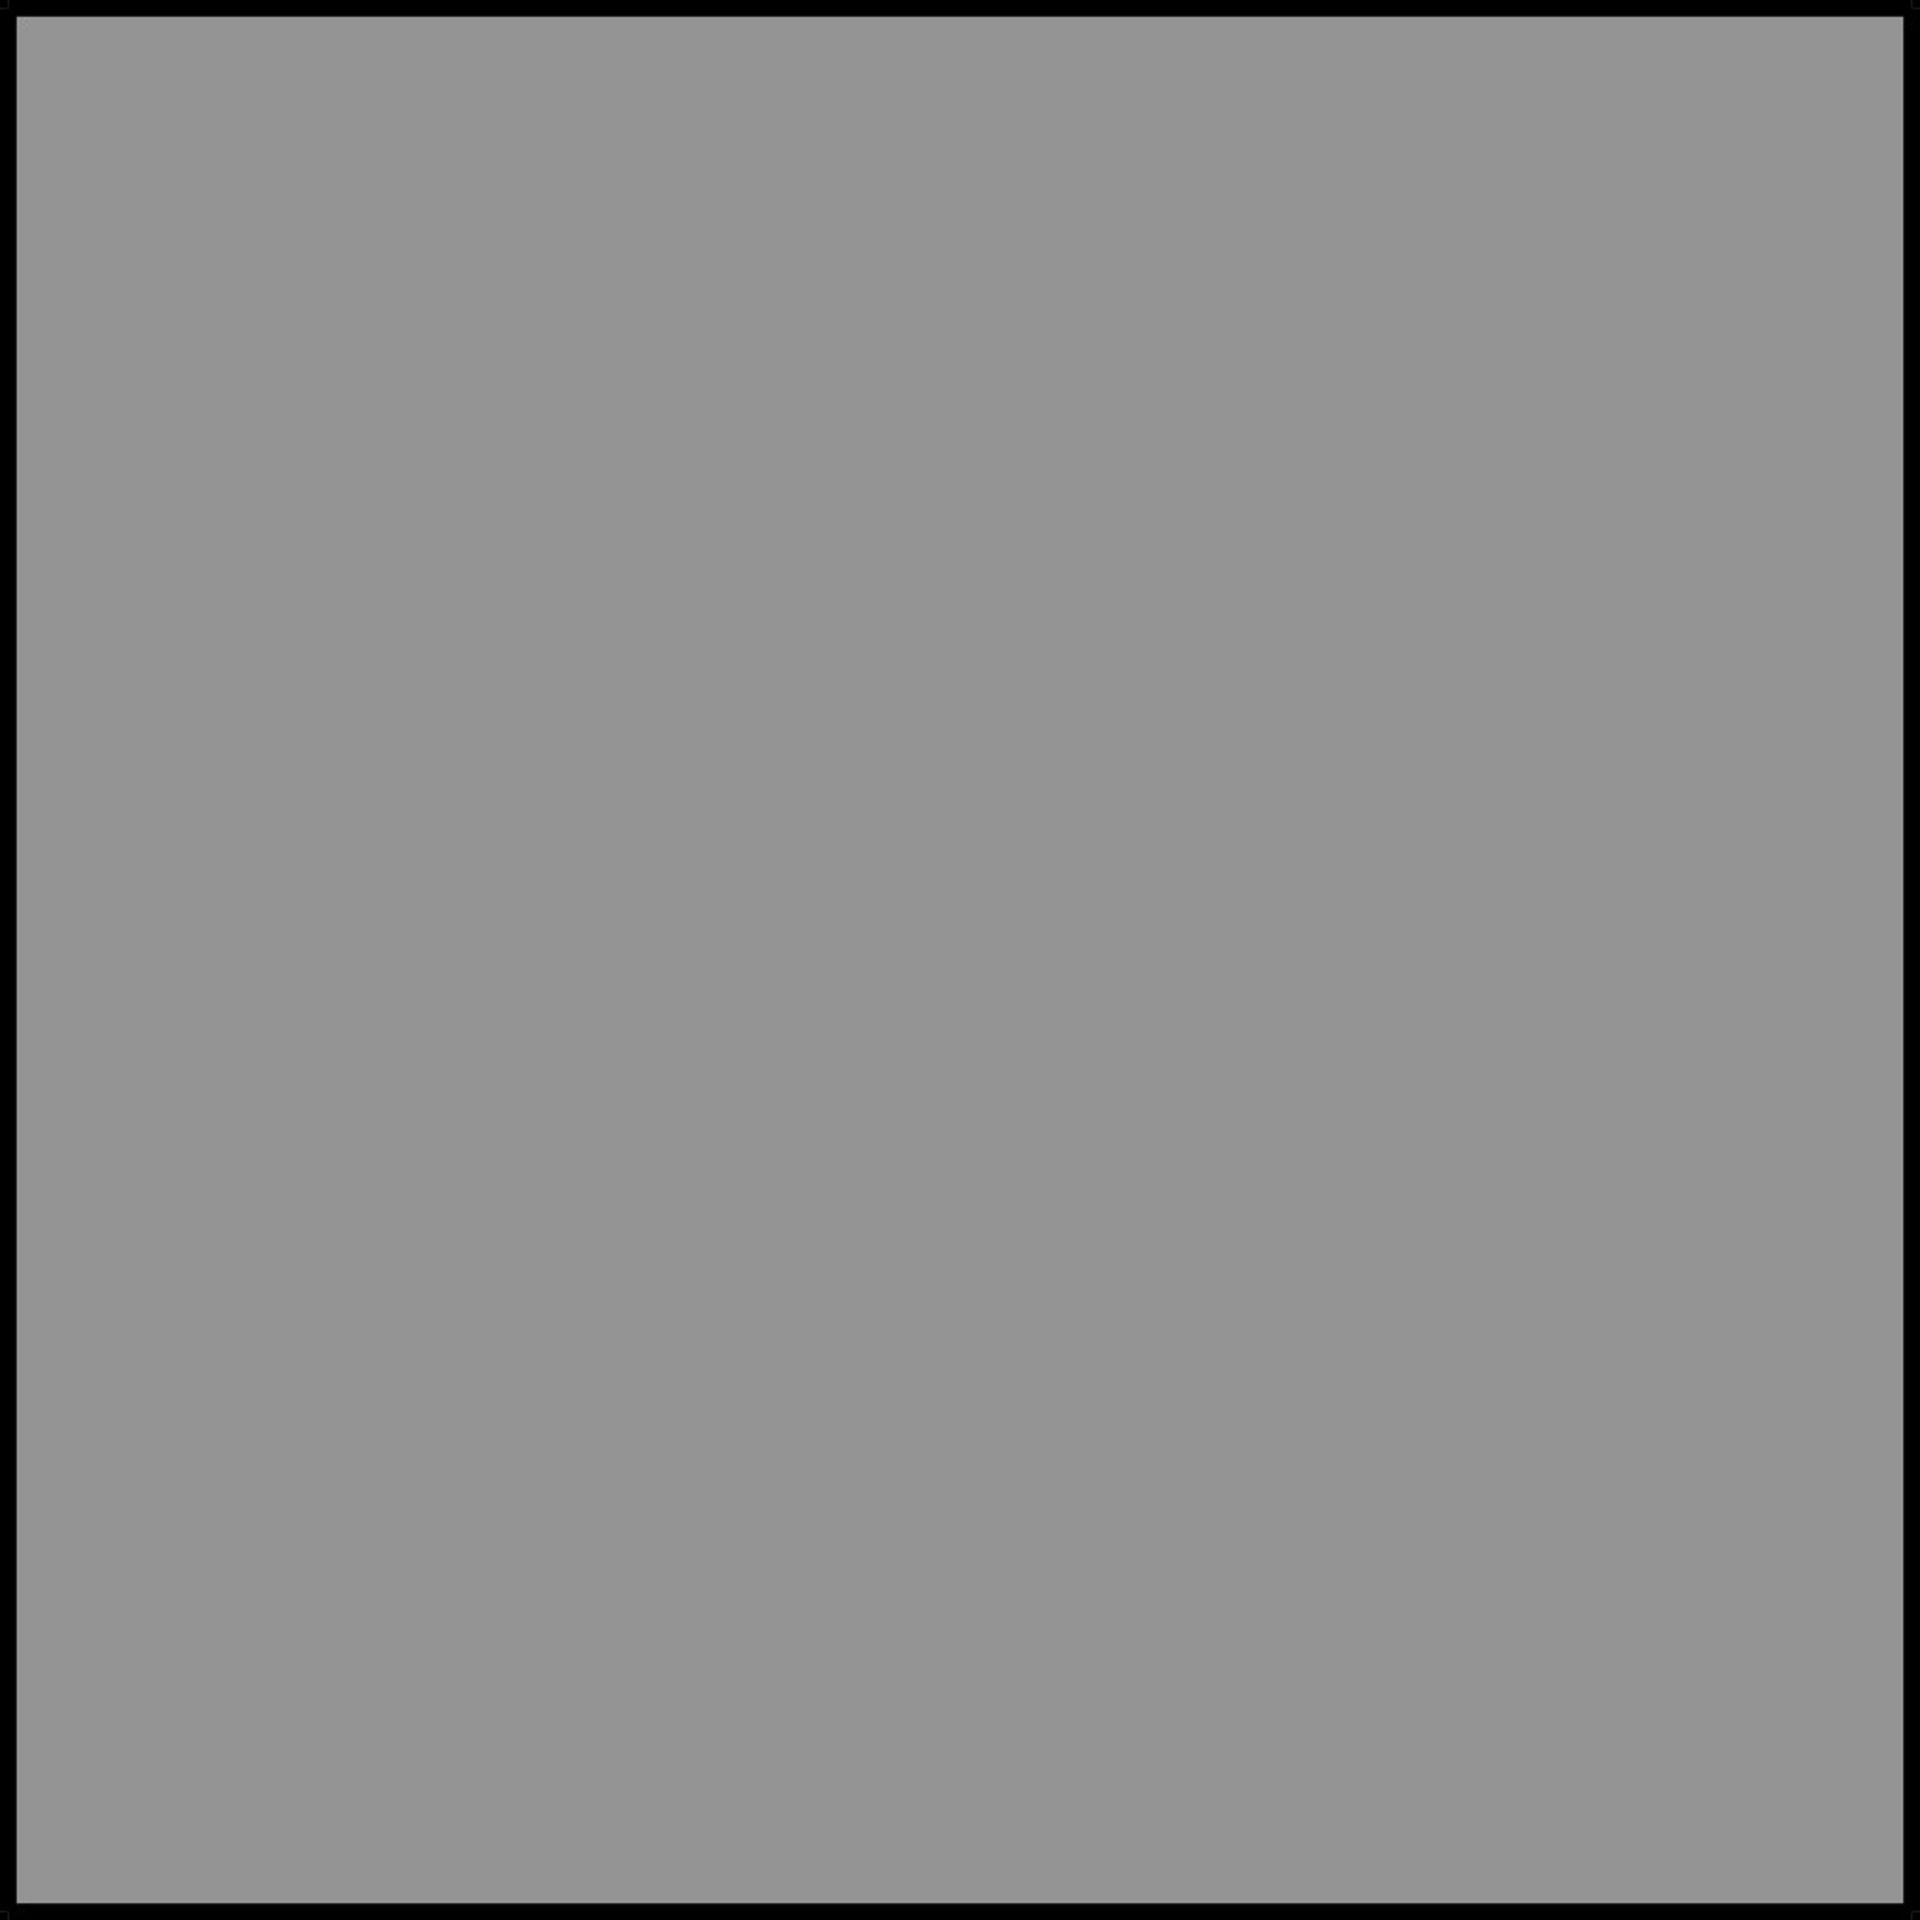 A - Quadrat